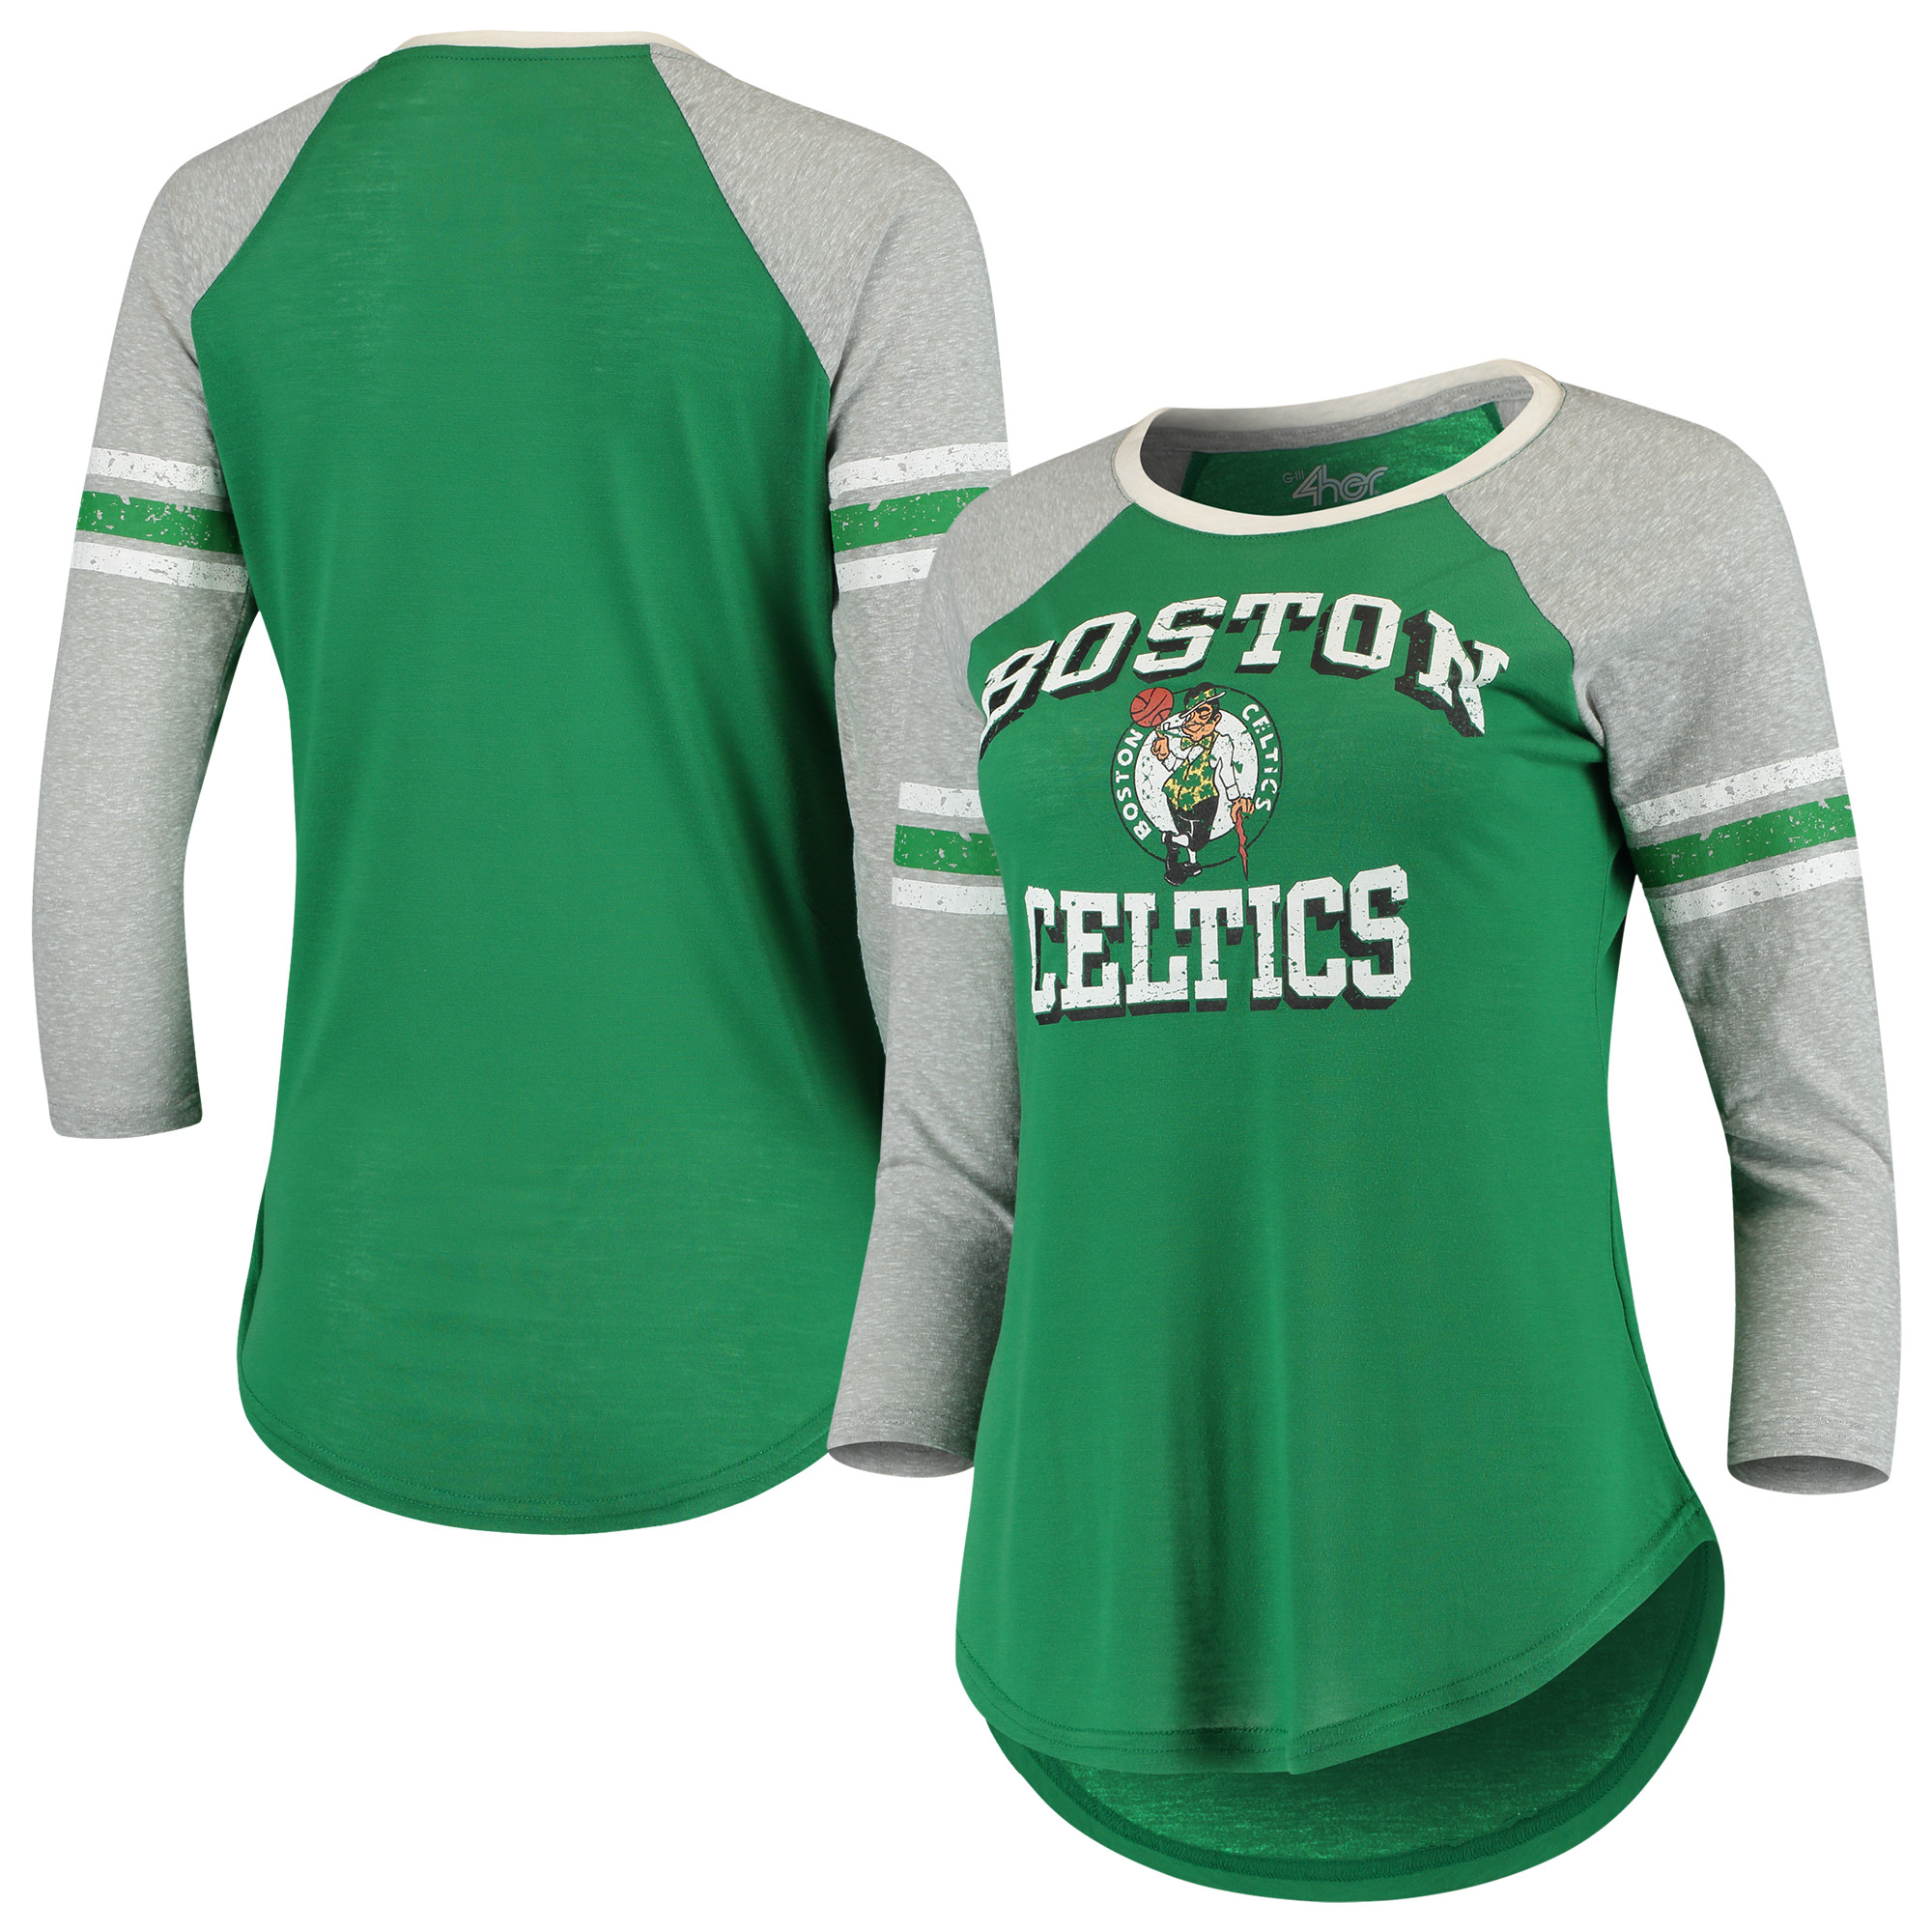 NBA Boston Celtics Women/'s Premium Triblend 3//4 Sleeve Shirt Raglan Green New